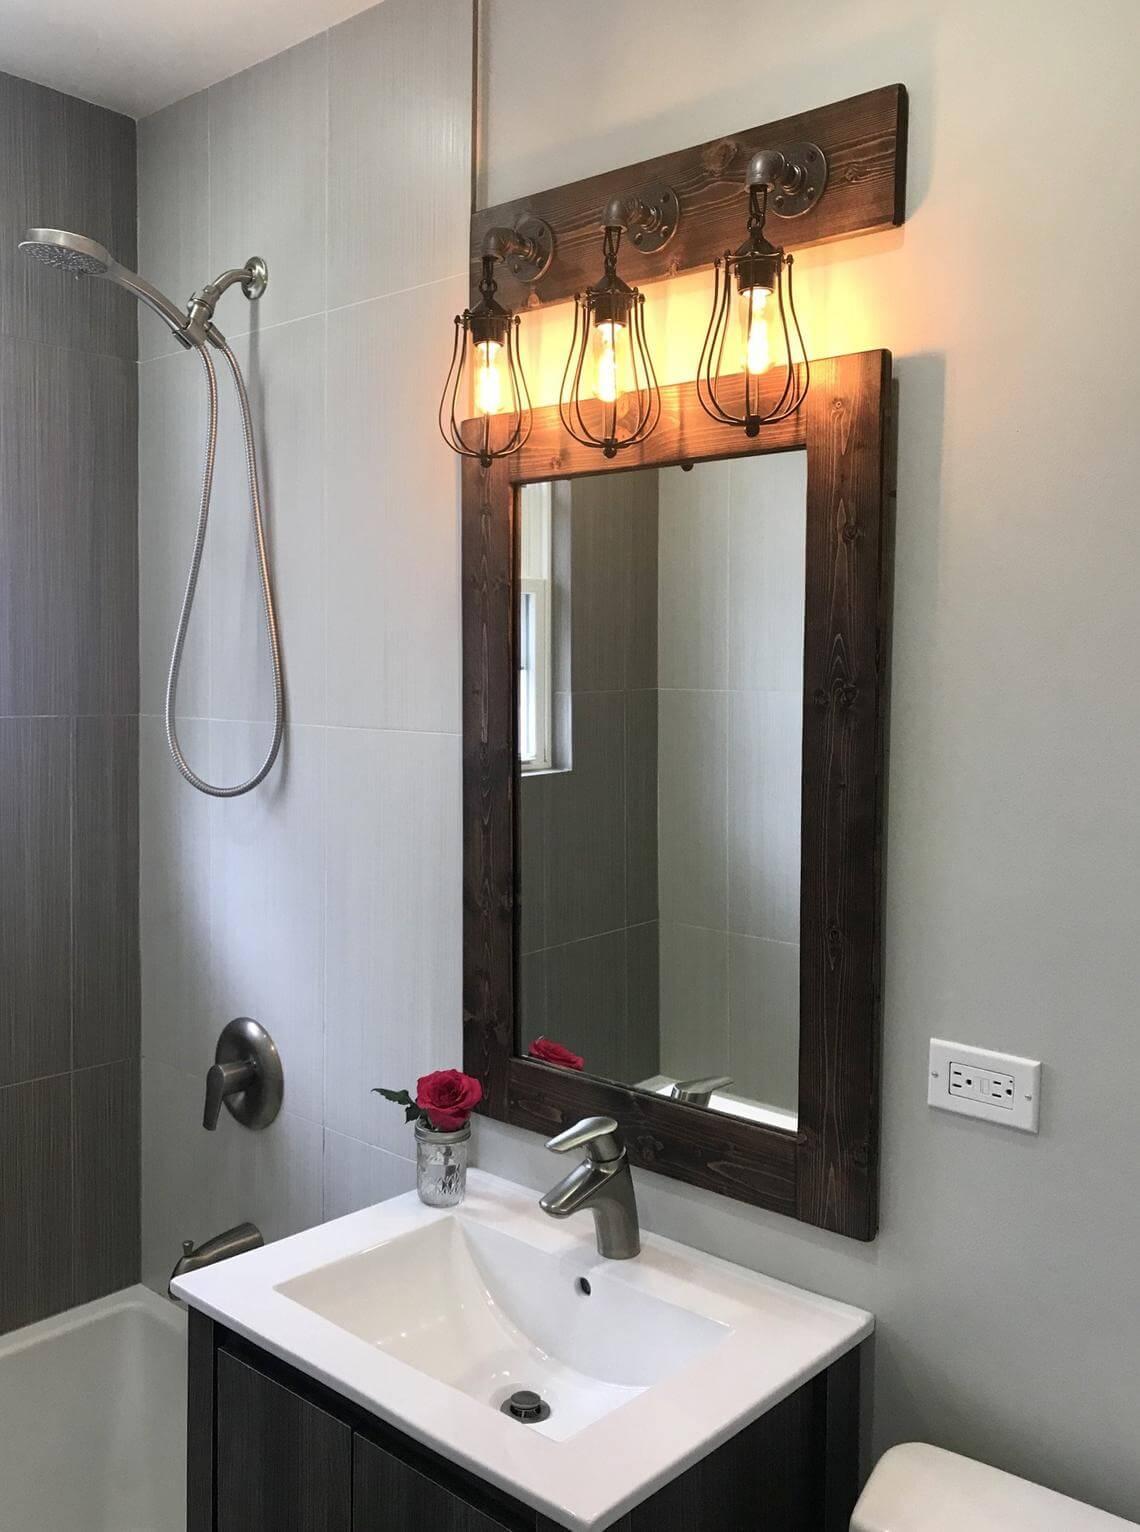 Caged Bathroom Vanity Lighting Fixture Set